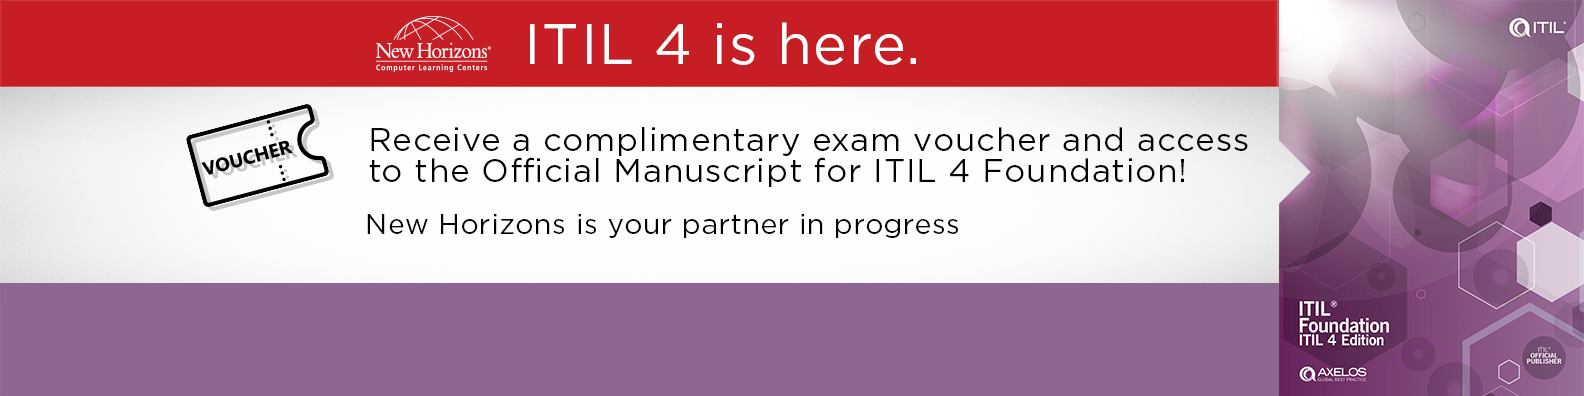 LinkedIn - ITIL 4 is Here